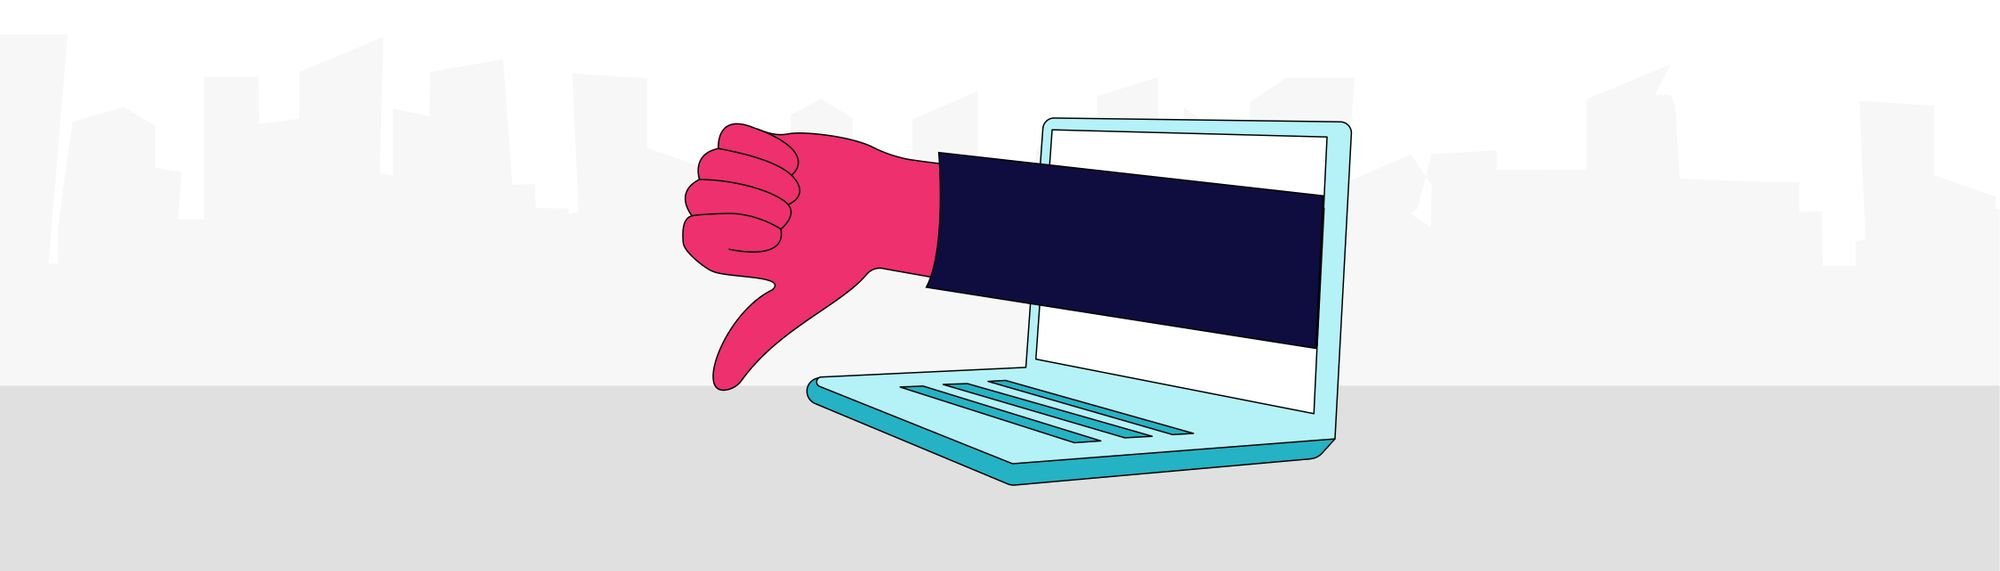 disadvantages of virtual recruitment